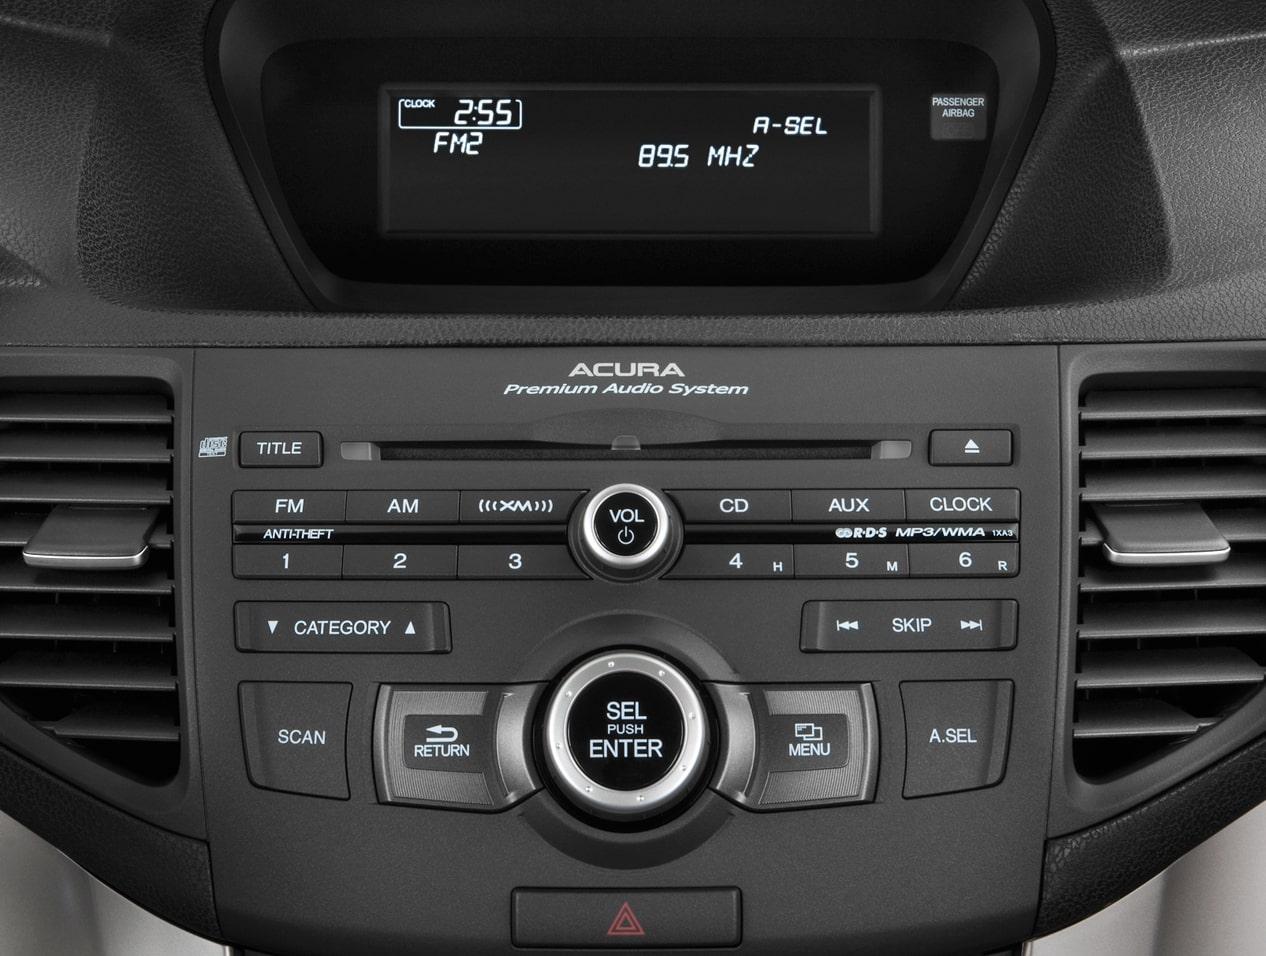 How to retrieve radio code on 2012 acura tsx